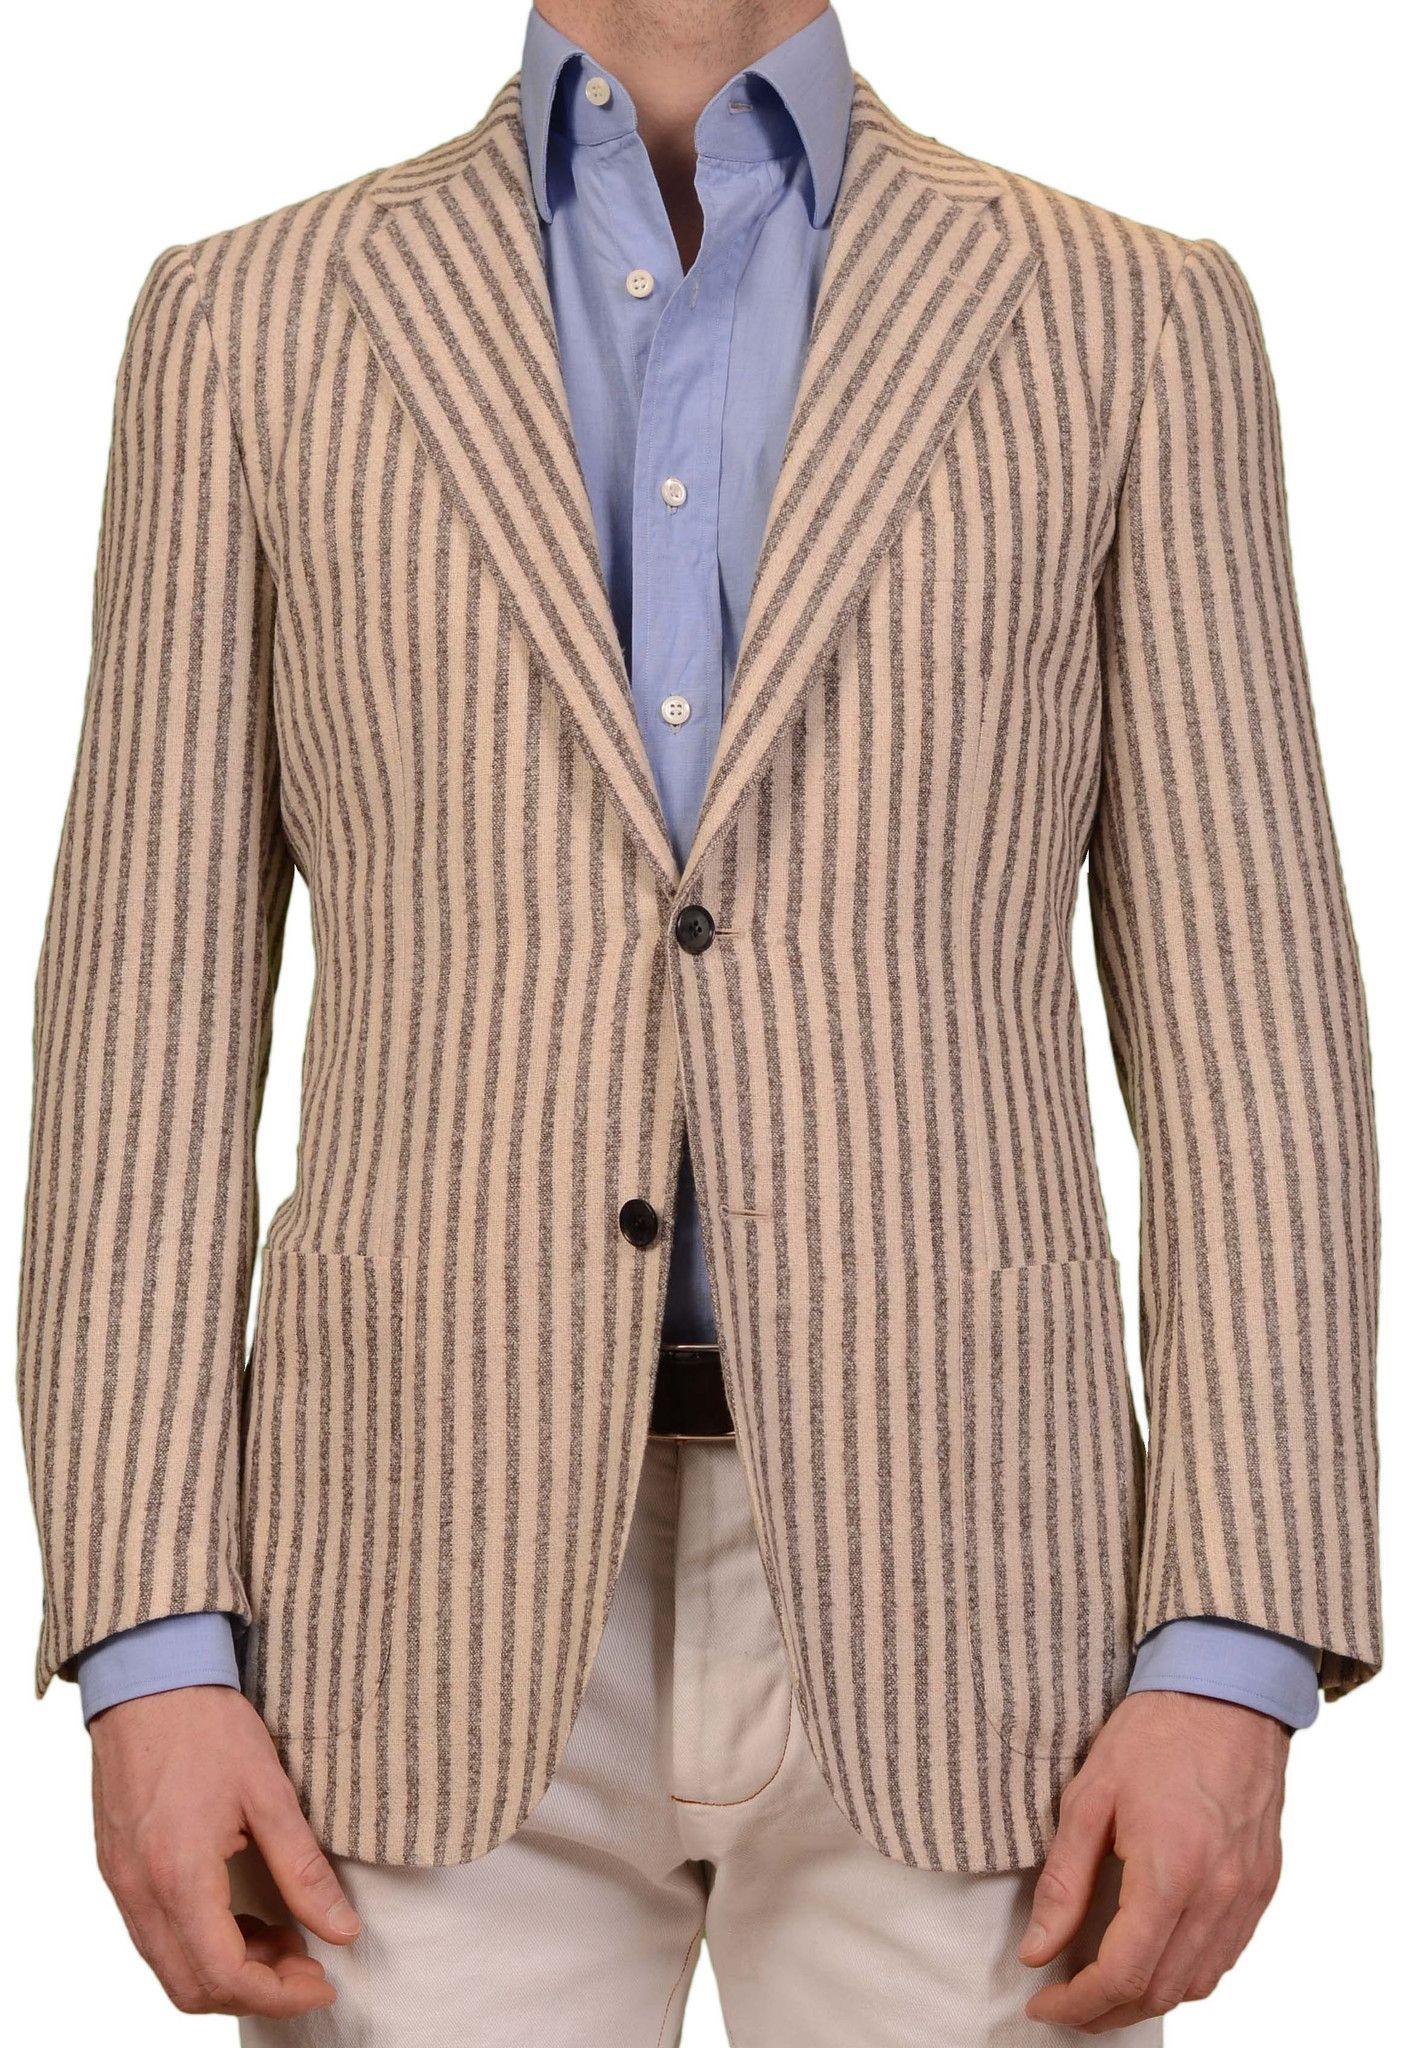 Flannel jackets with hood  SARTORIO Napoli by KITON Beige Striped Wool Alpaca Flannel Jacket